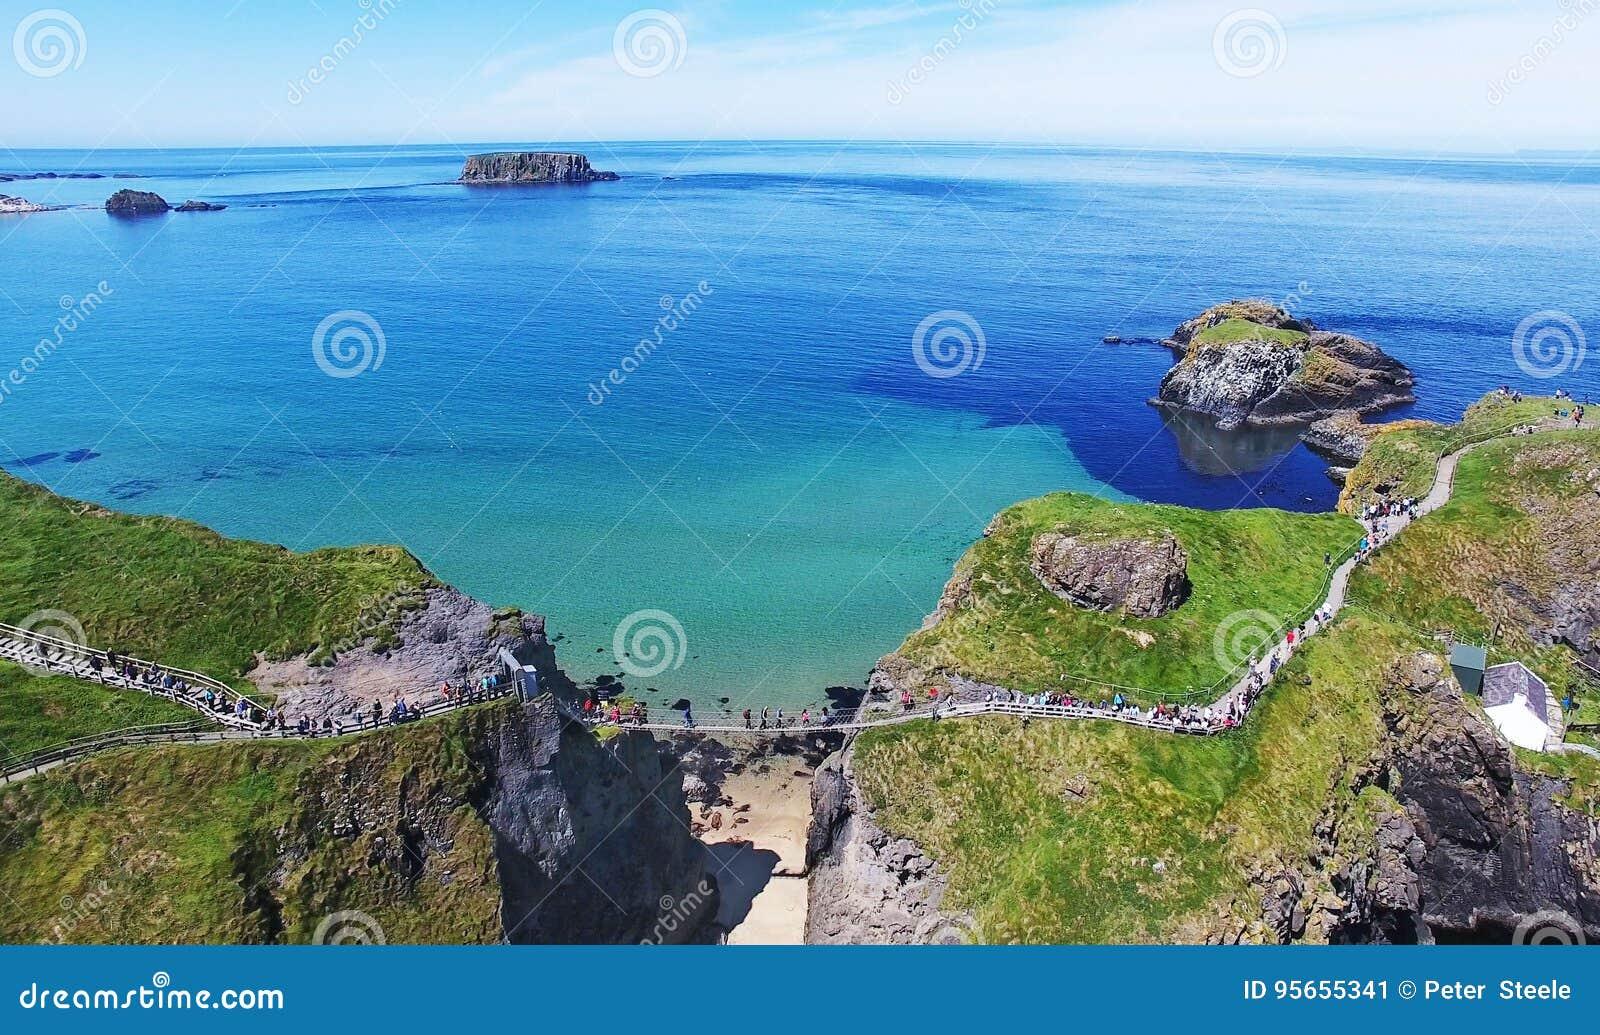 Carrick-a-Rede Rope Bridge County Antrim Northern Ireland